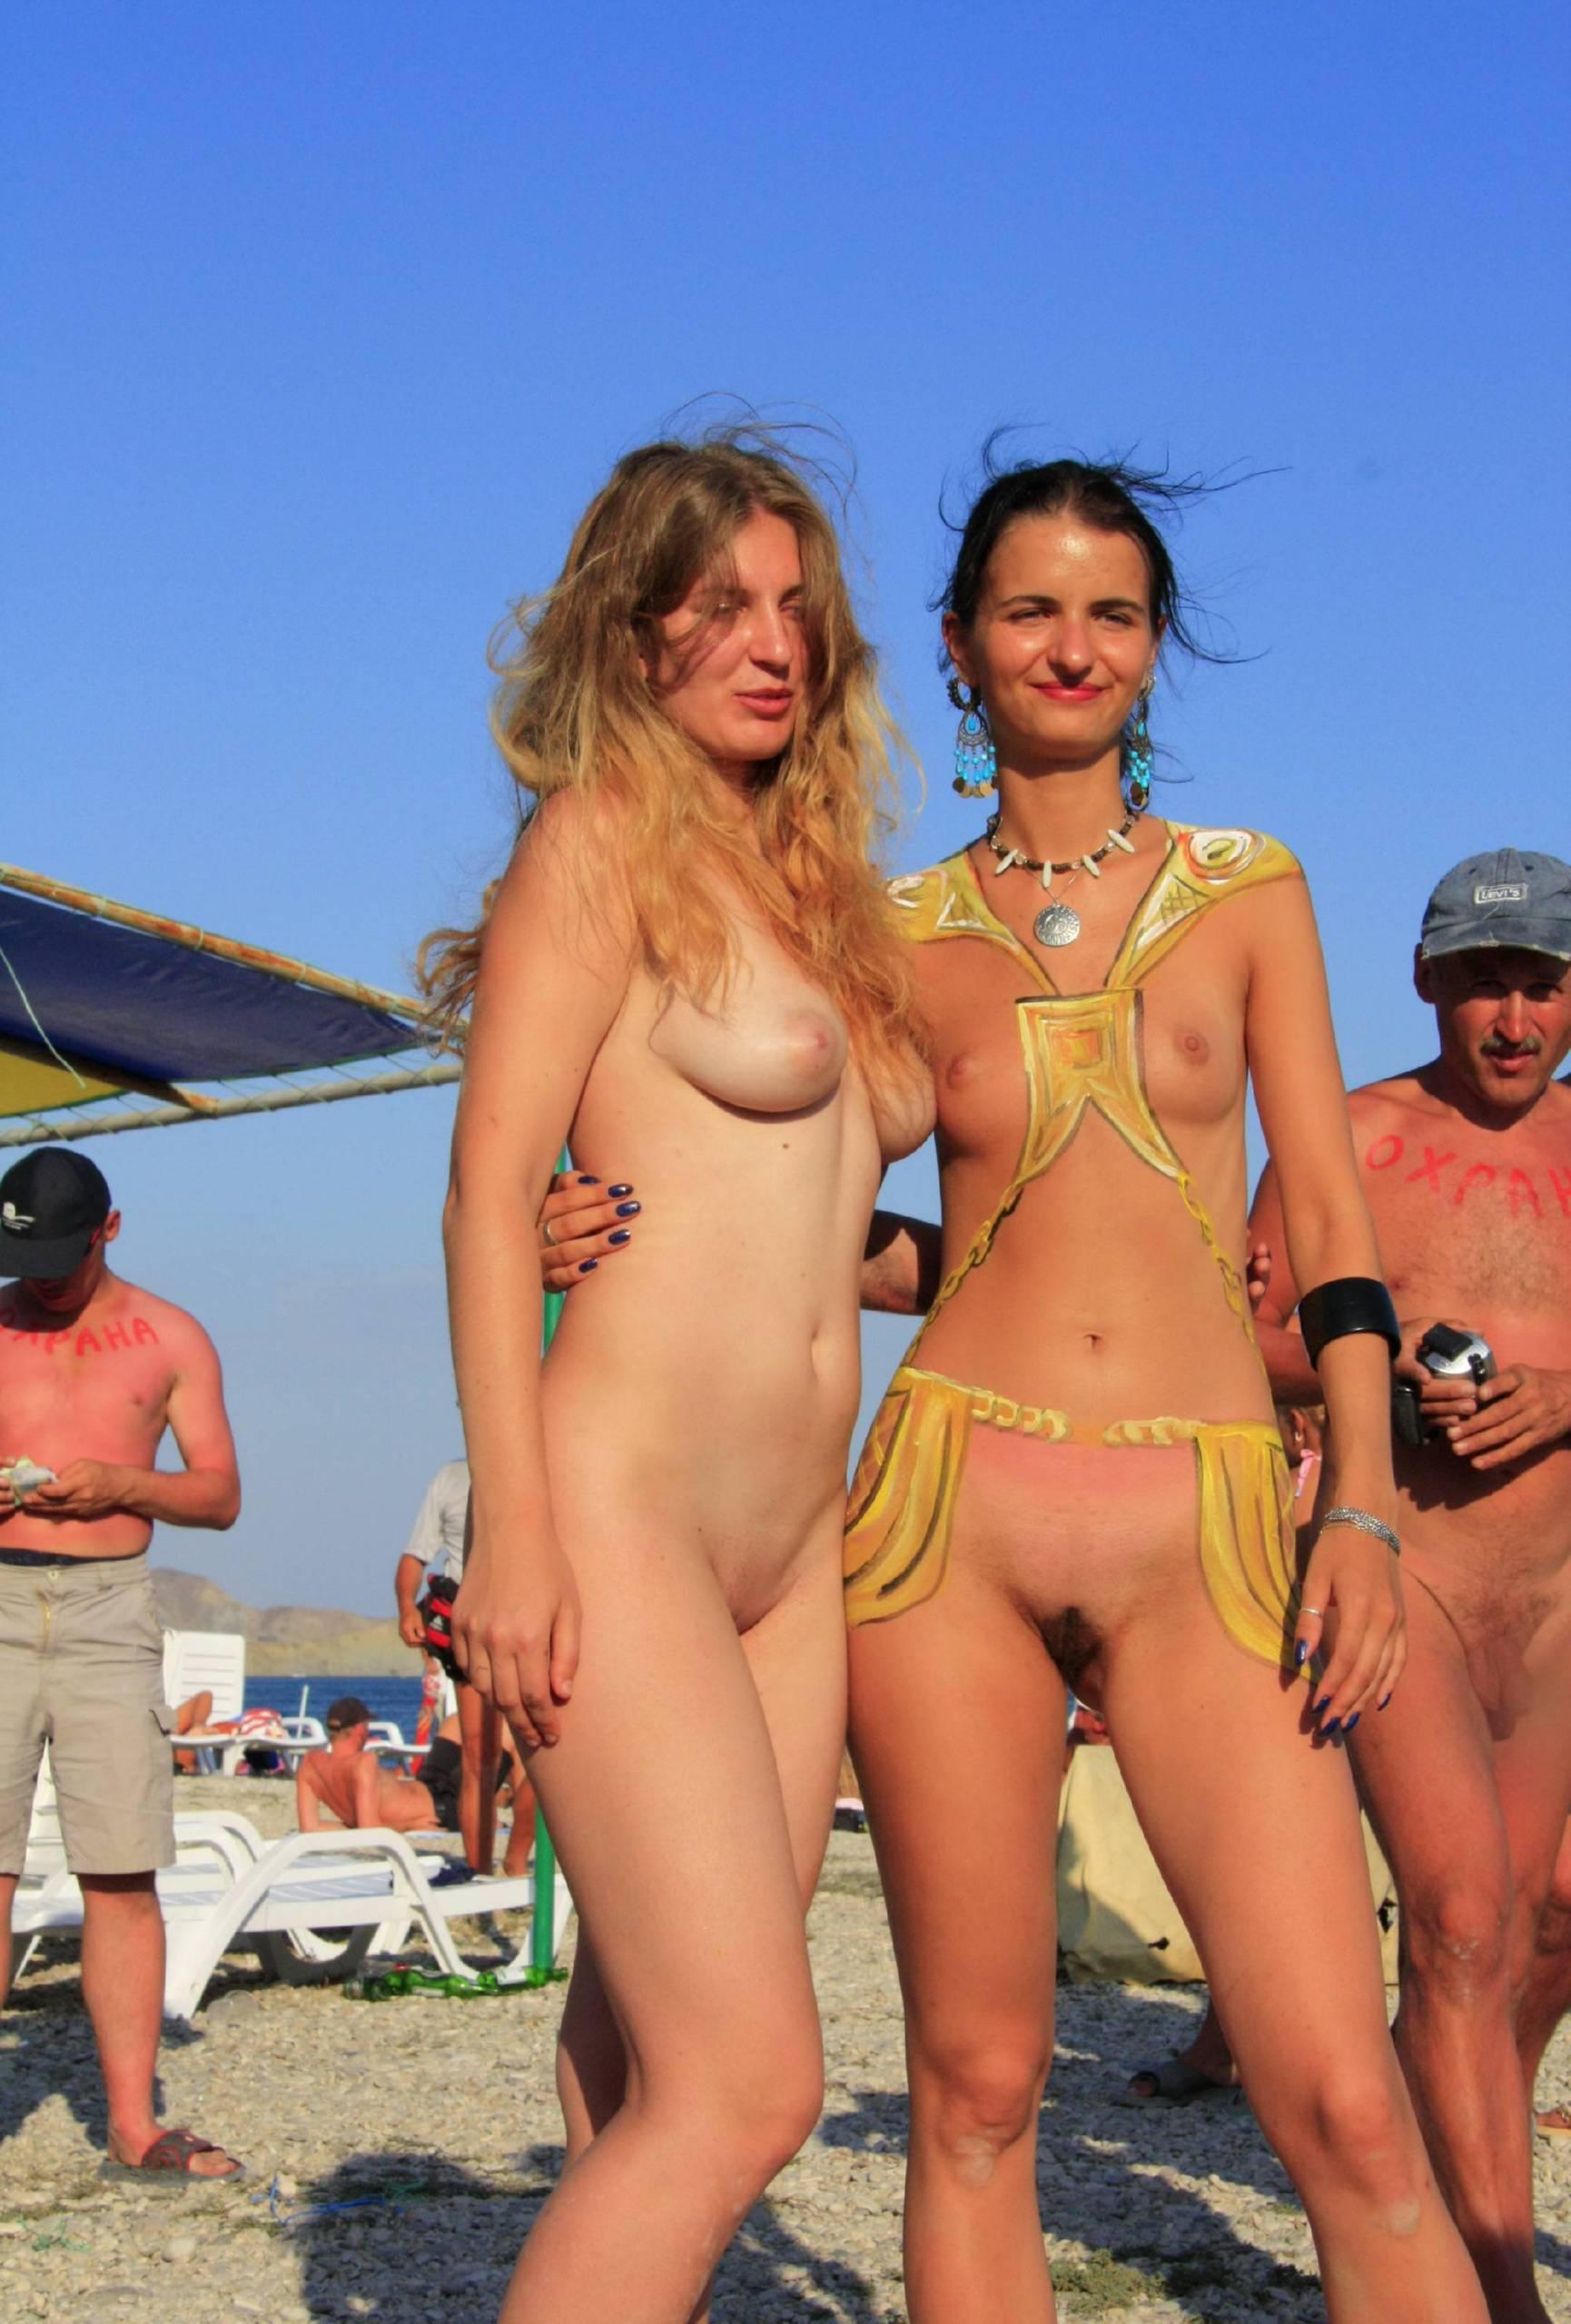 Nudist Photos Festival Evening Grouping - 2